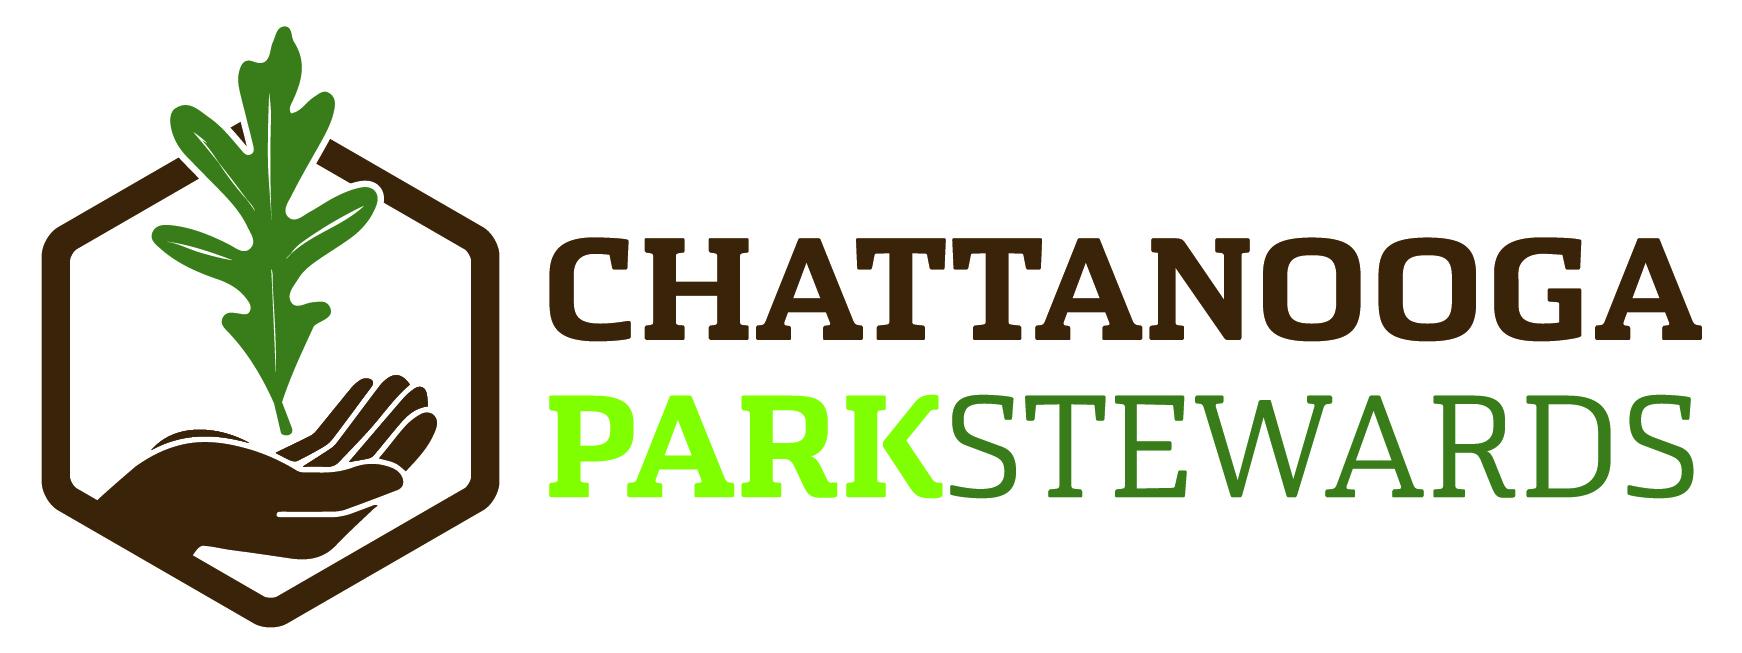 chattanoogaparkstewardslogos-02